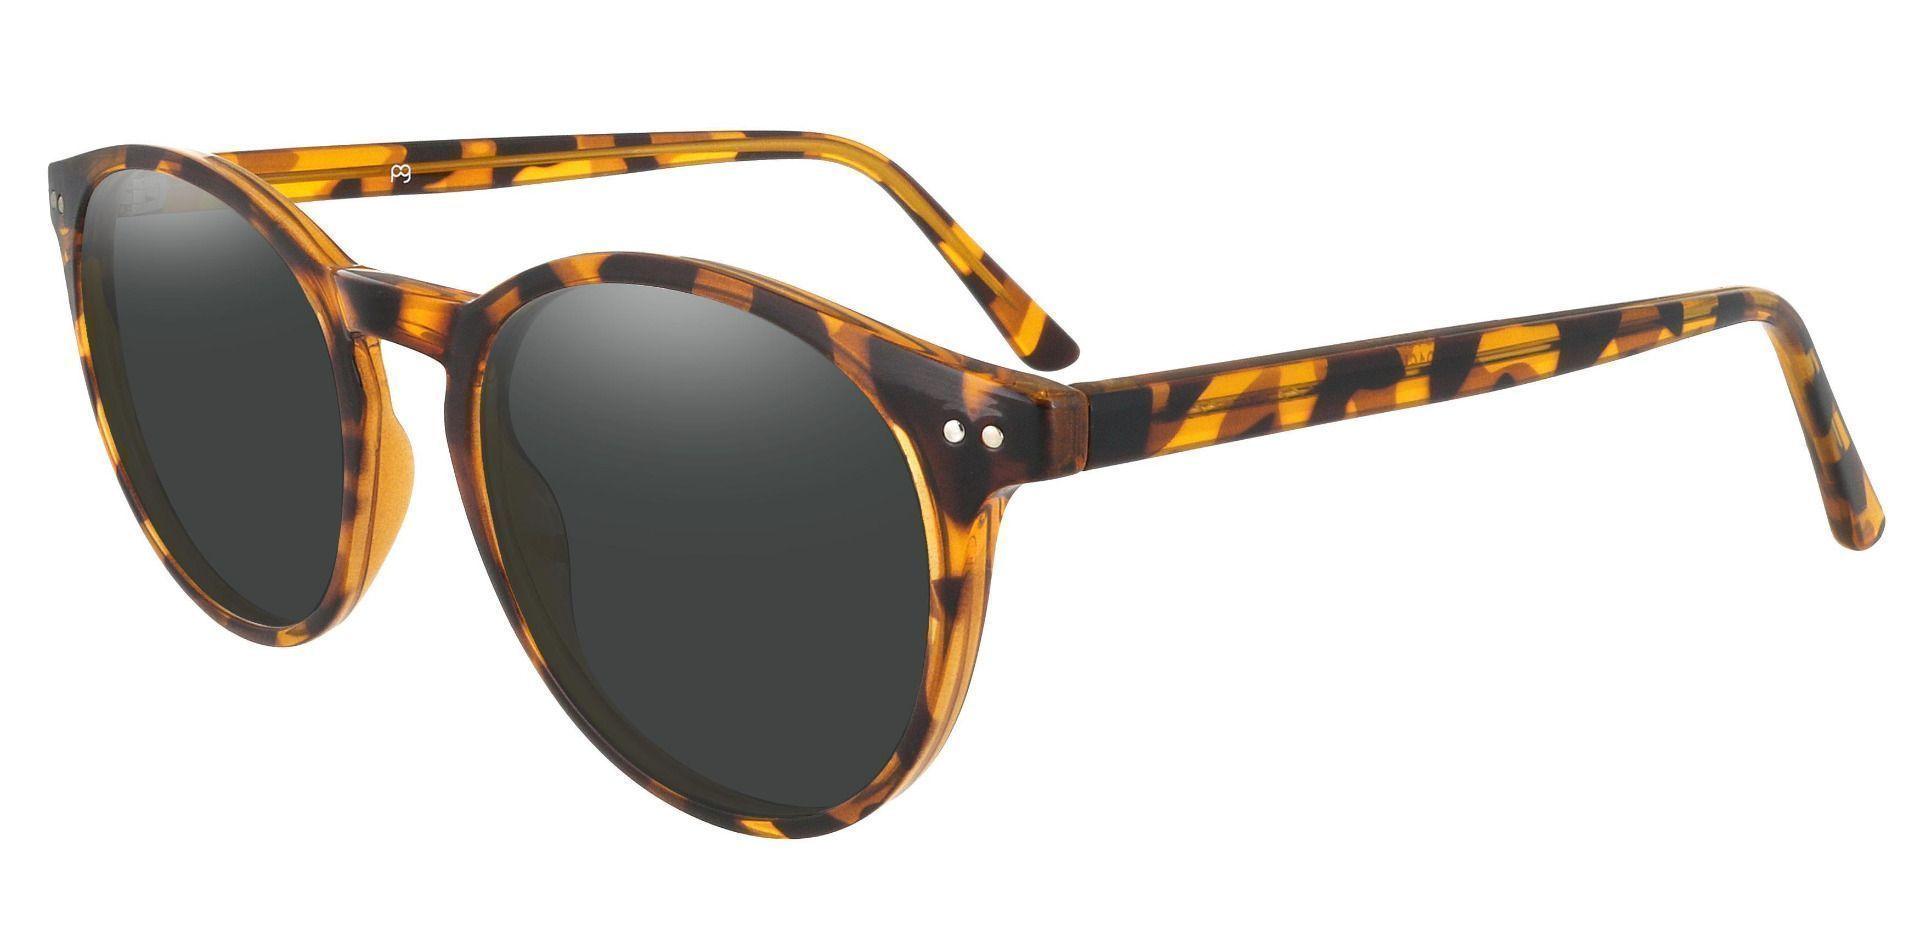 Dormont Round Prescription Sunglasses - Leopard Frame With Gray Lenses